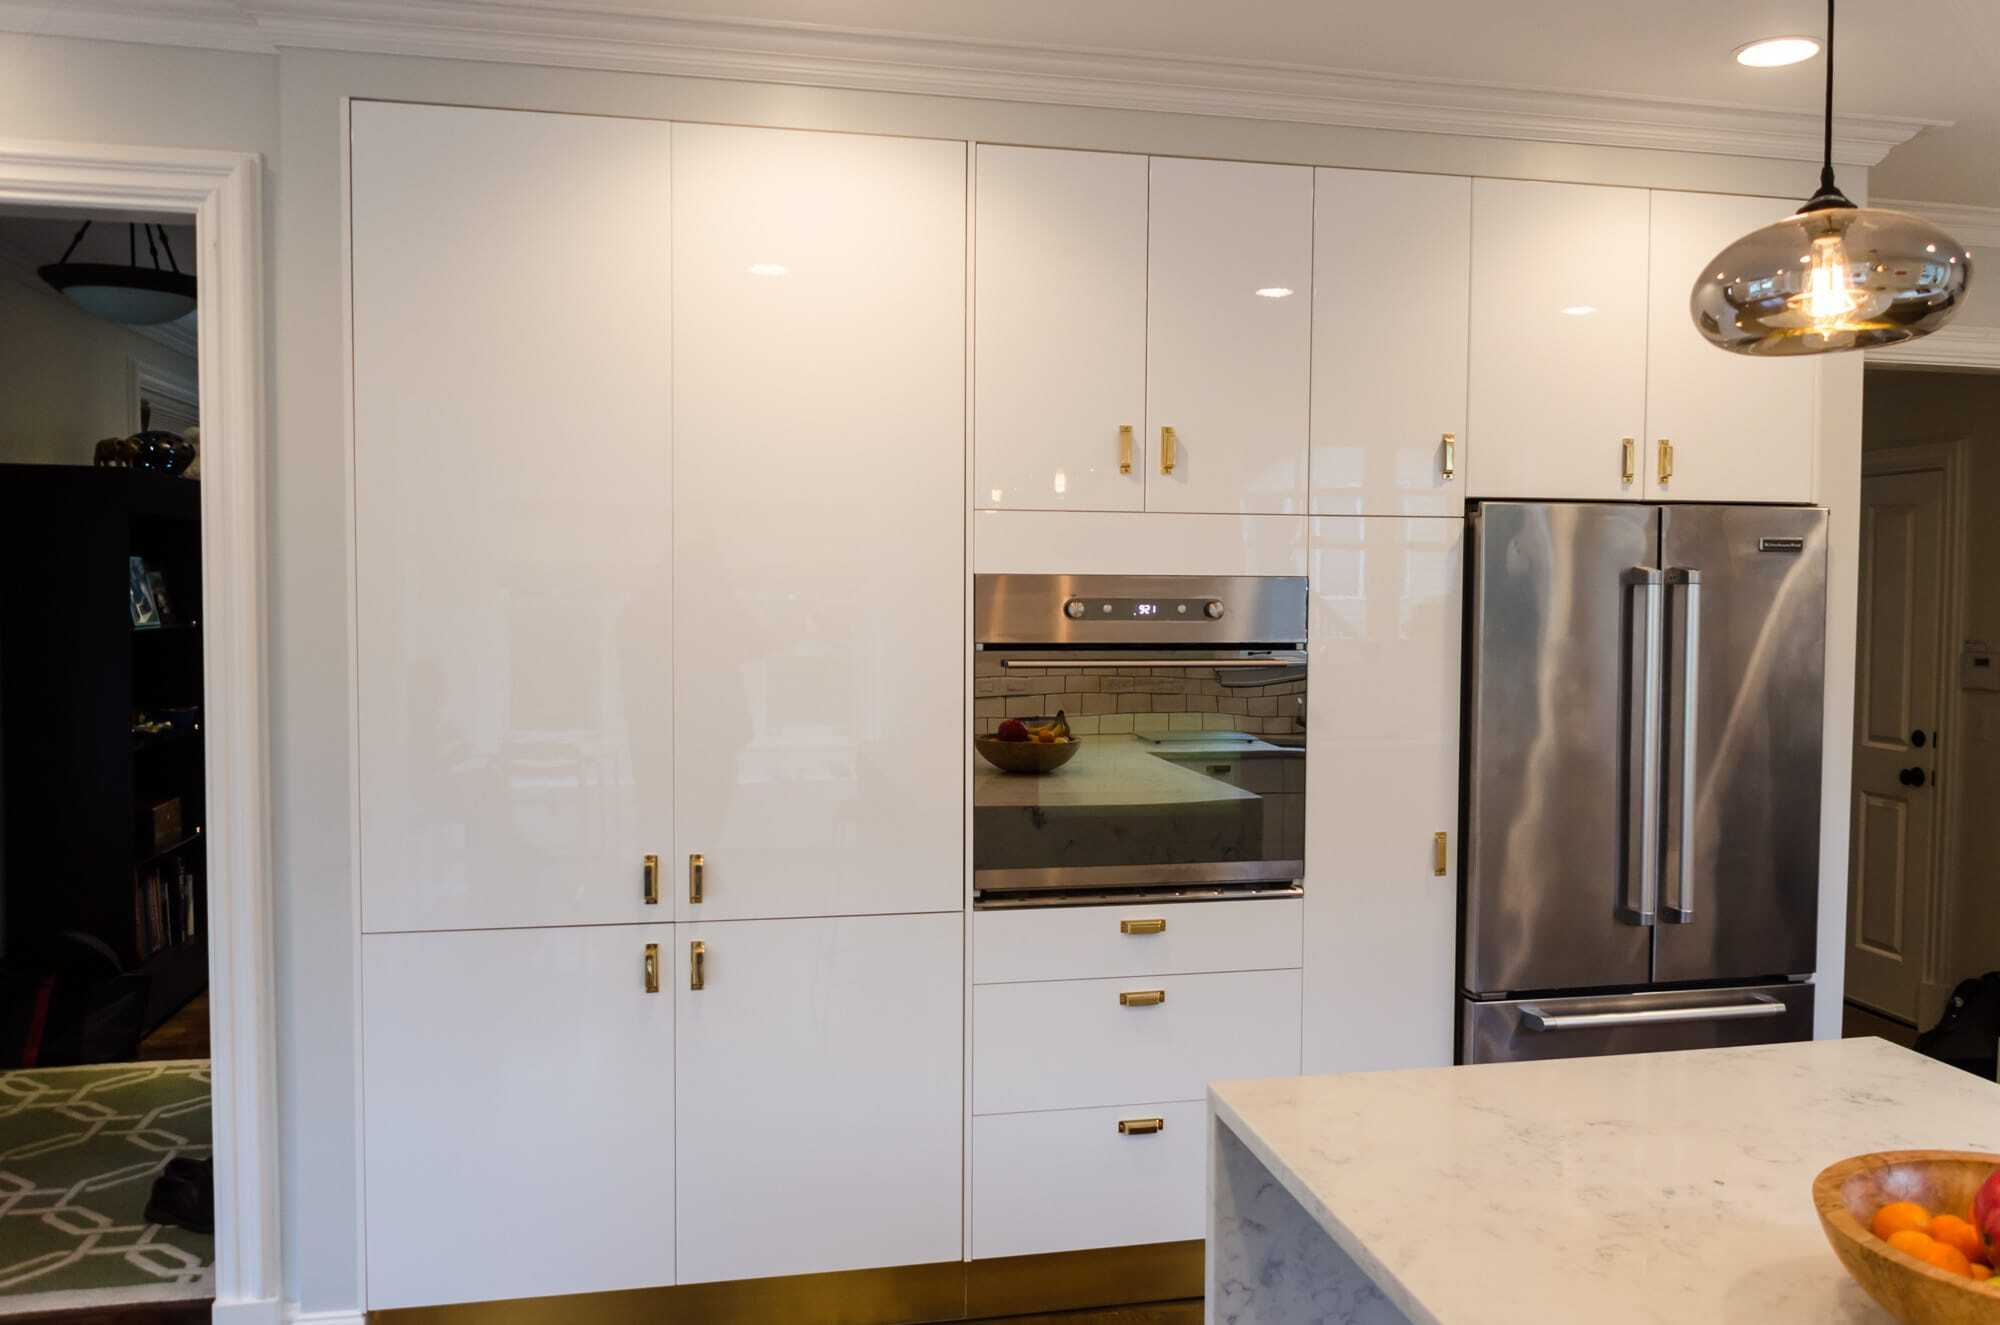 Countertop Appliance Garage : Appliance.Garage.IKEA.Hack.2